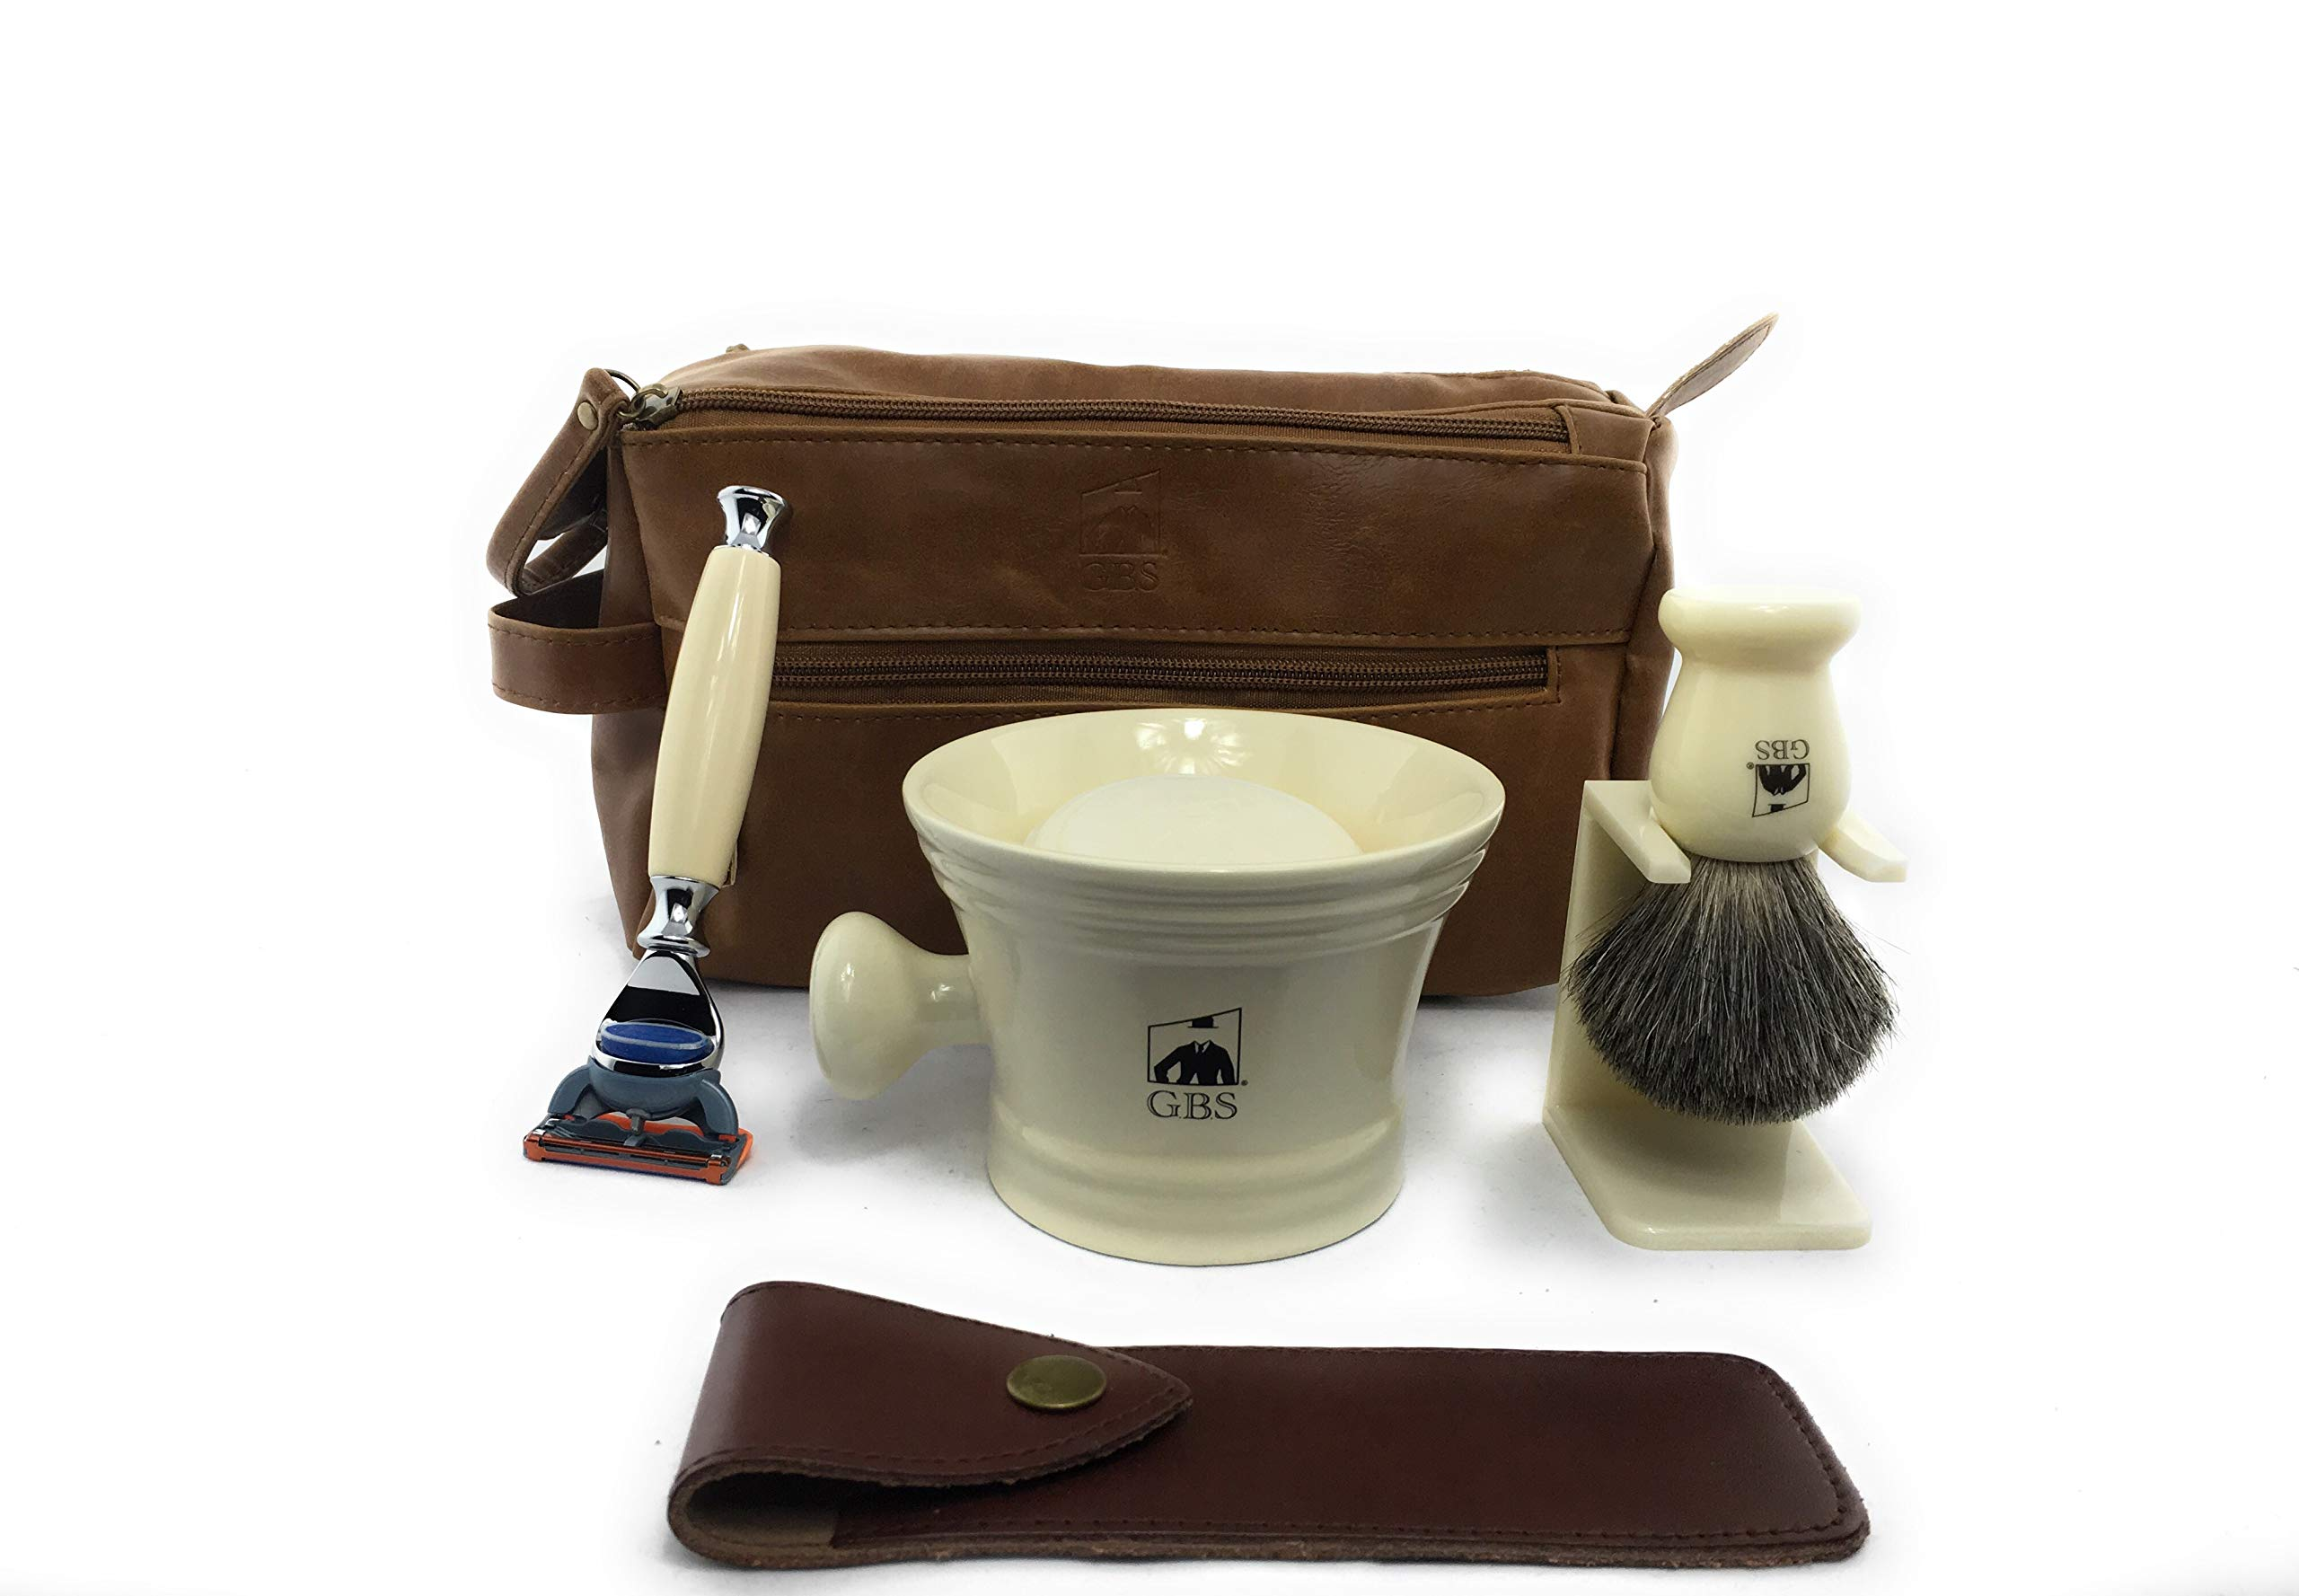 "GBS Men's Deluxe Grooming Set Dopp Kit Ivory Compatible w/ 5 Blade Razor & Case, Badger Bristle Brush Stand 4.5"" Diameter Ceramic Mug Toiletry Travel Bag + Natural Glycerin Shave Soap"